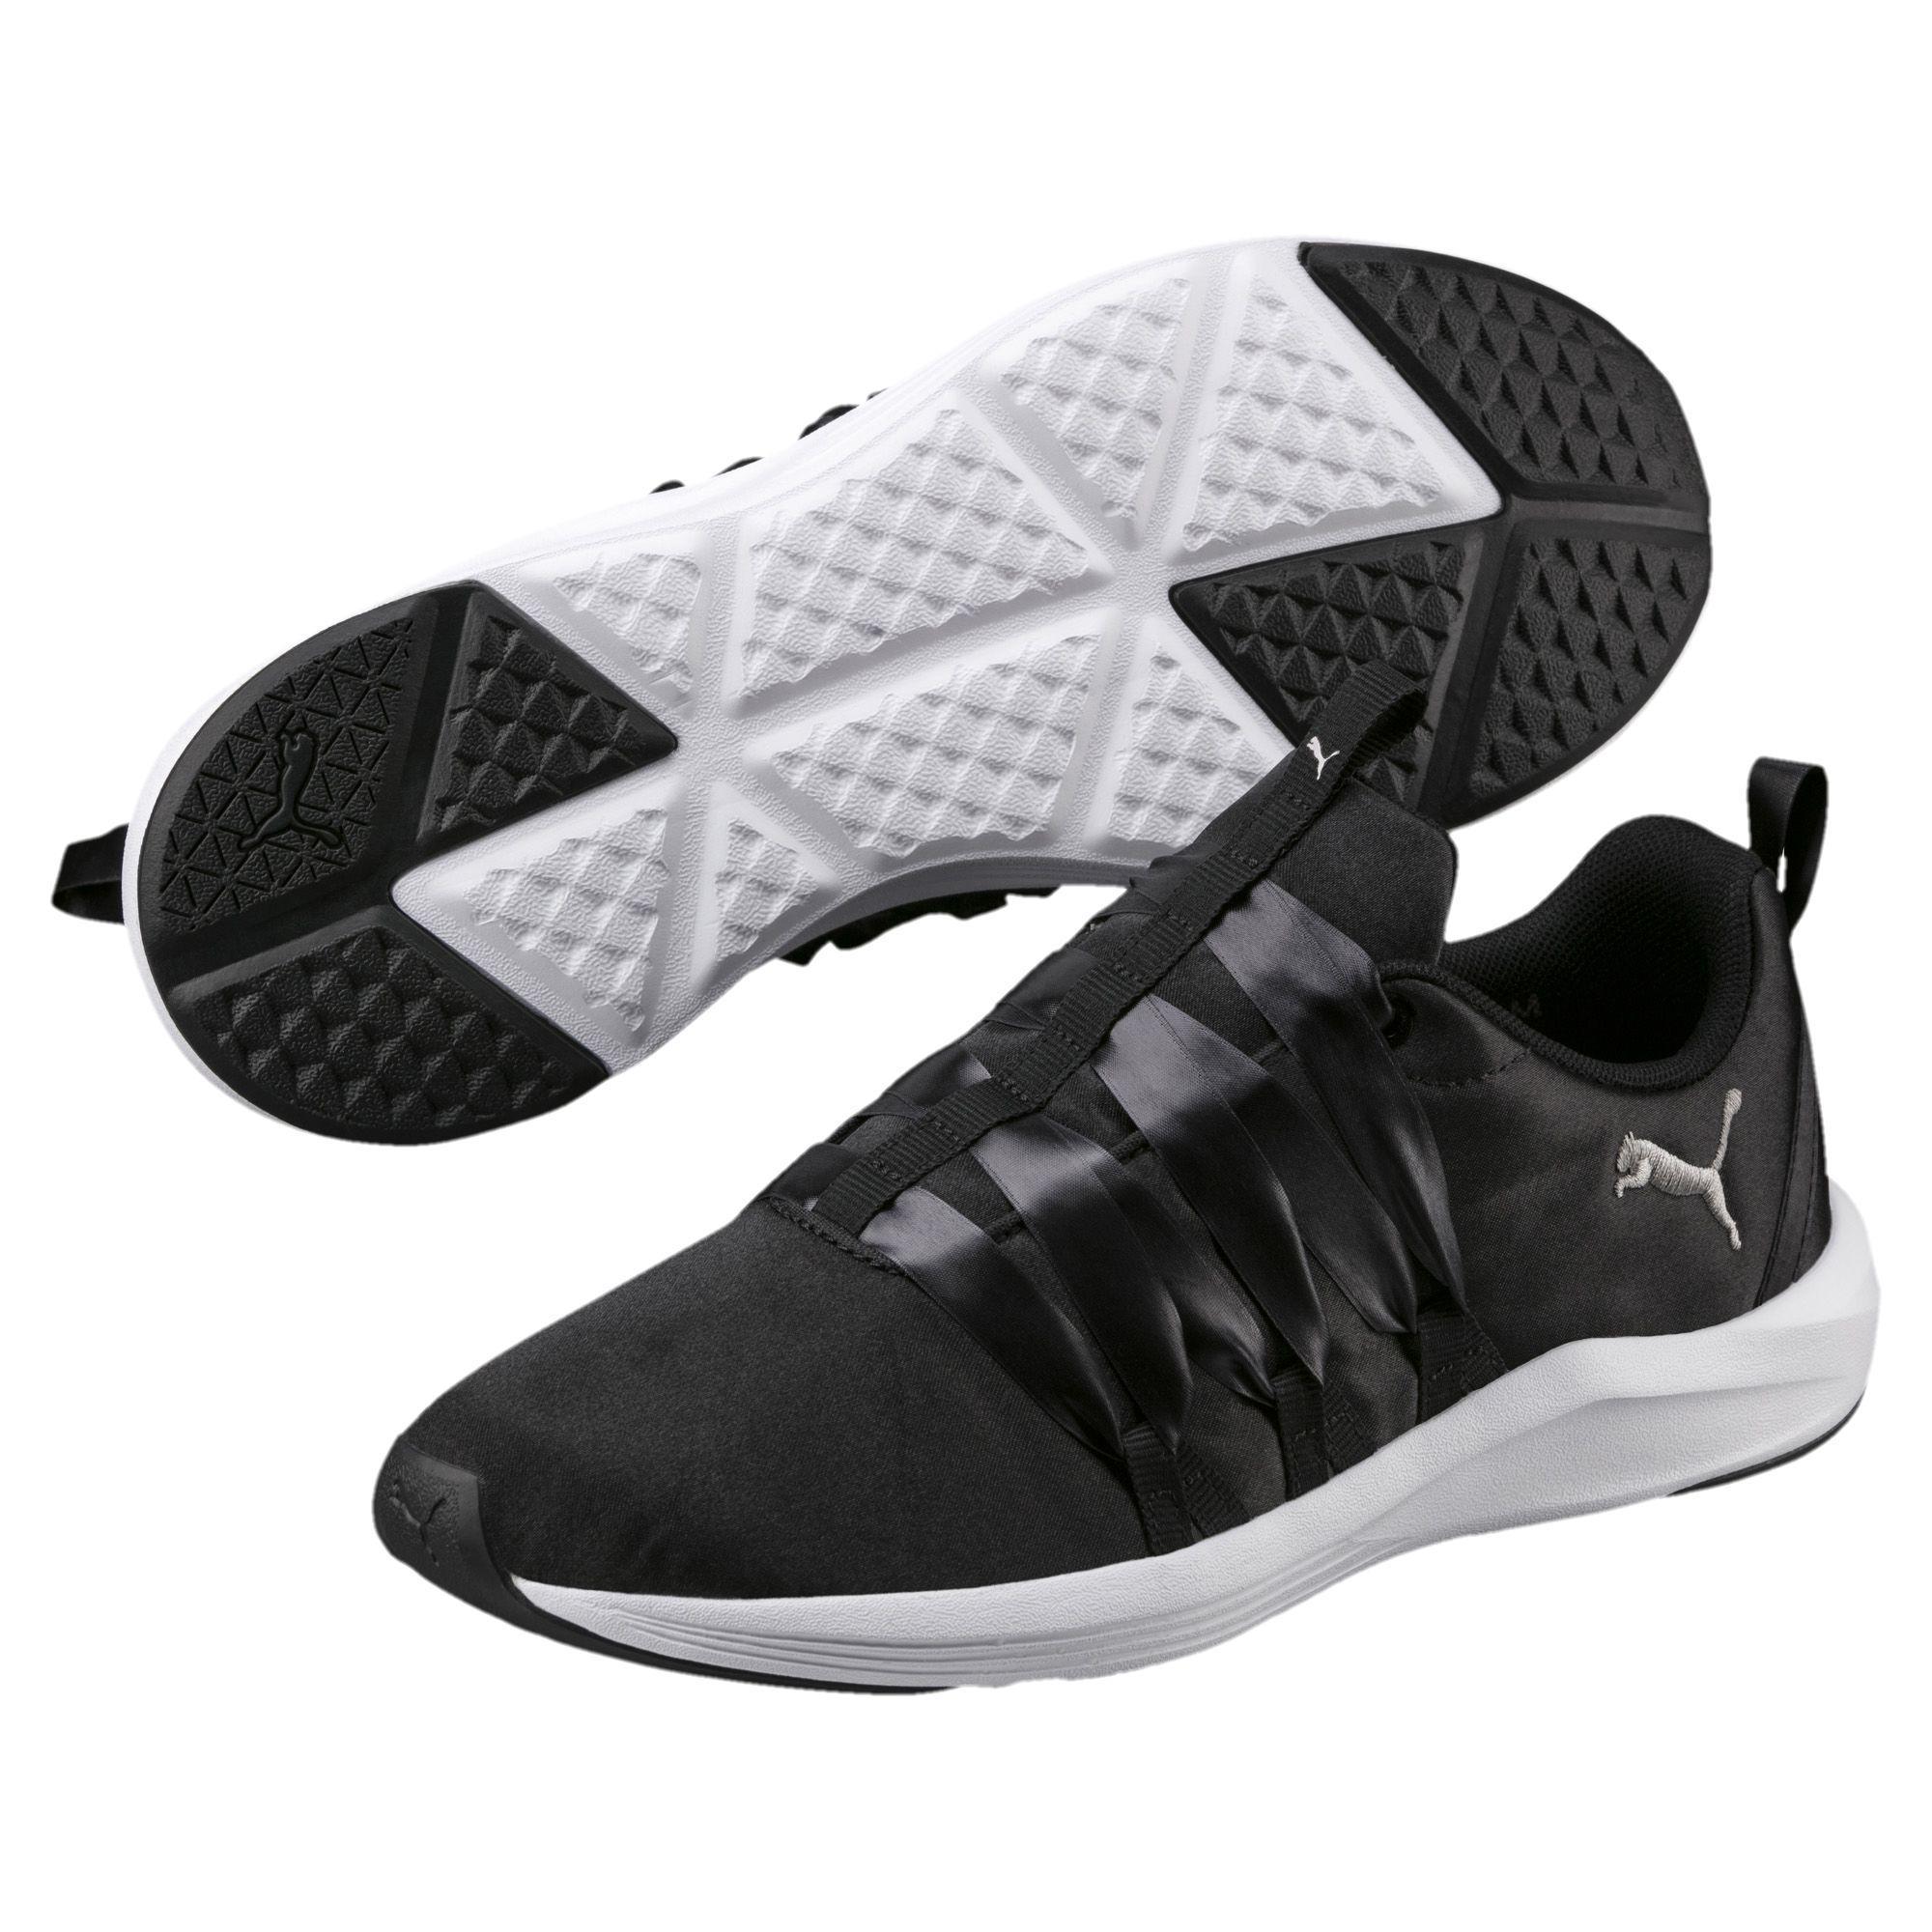 522696ef6b5 PUMA - Black Prowl Alt Satin Women s Training Shoes - Lyst. View fullscreen